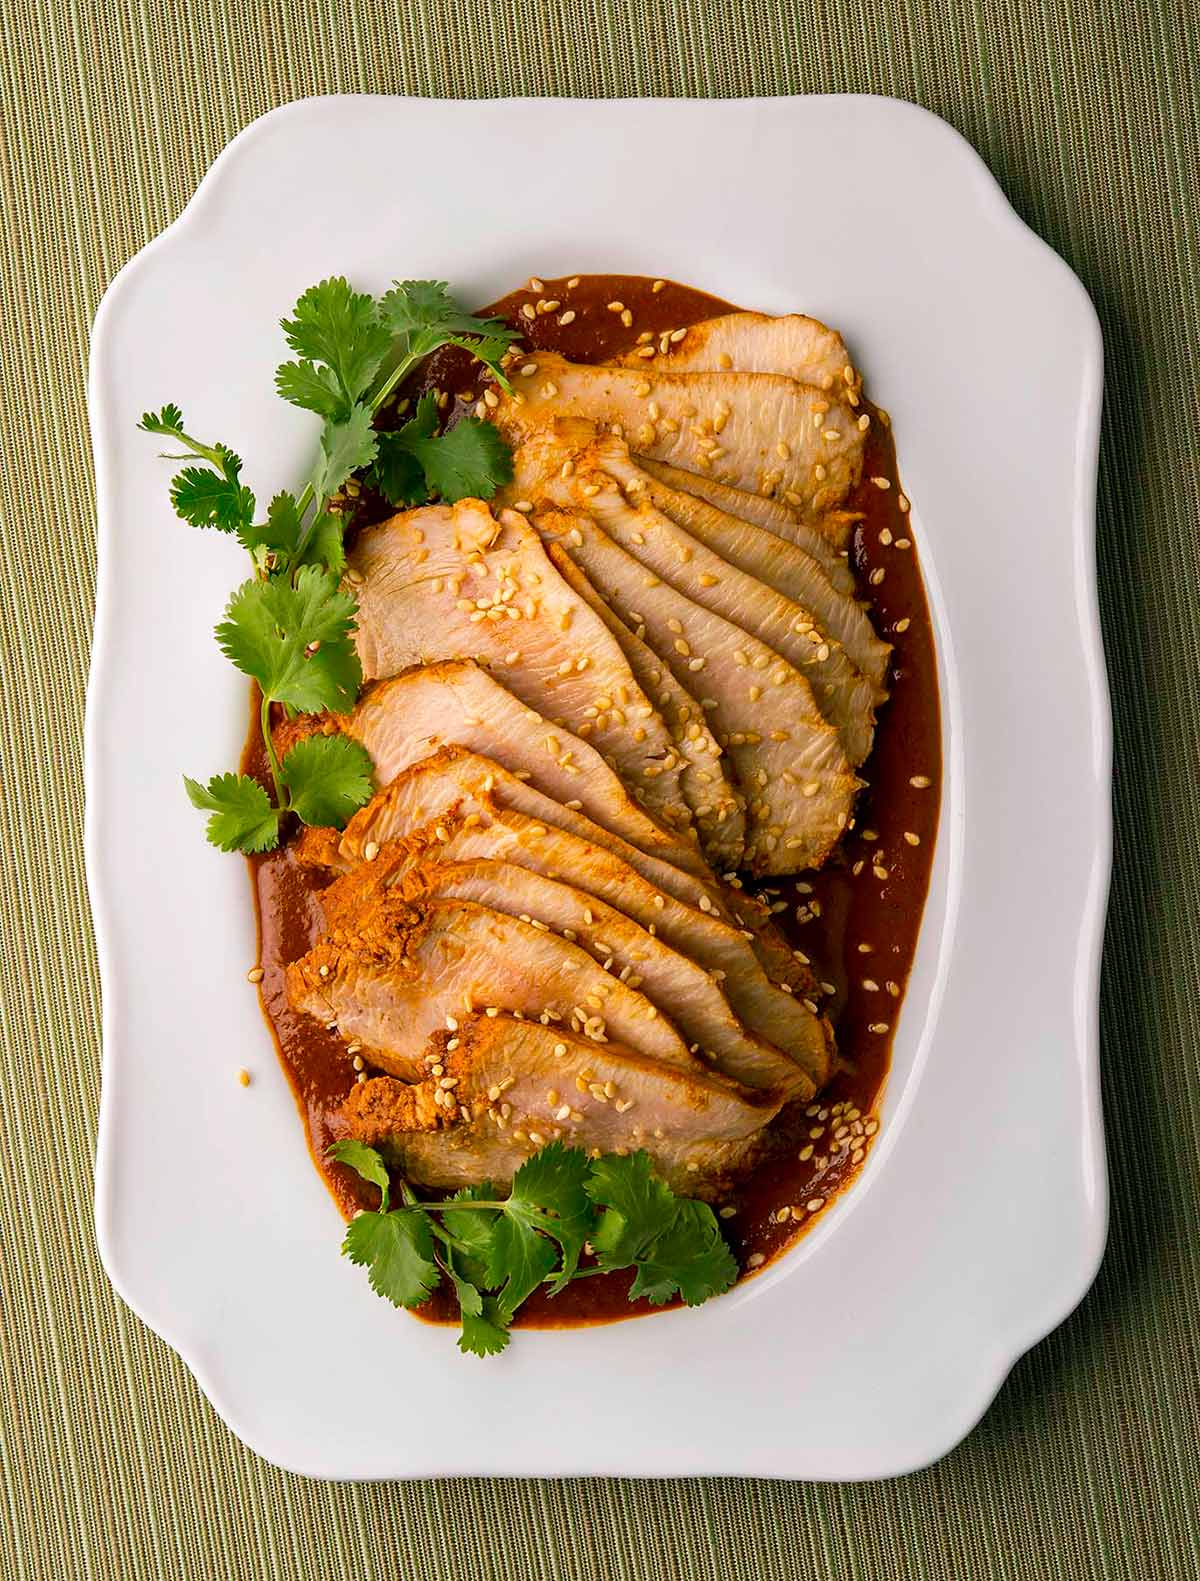 Slices of turkey breast with turkey mole sauce